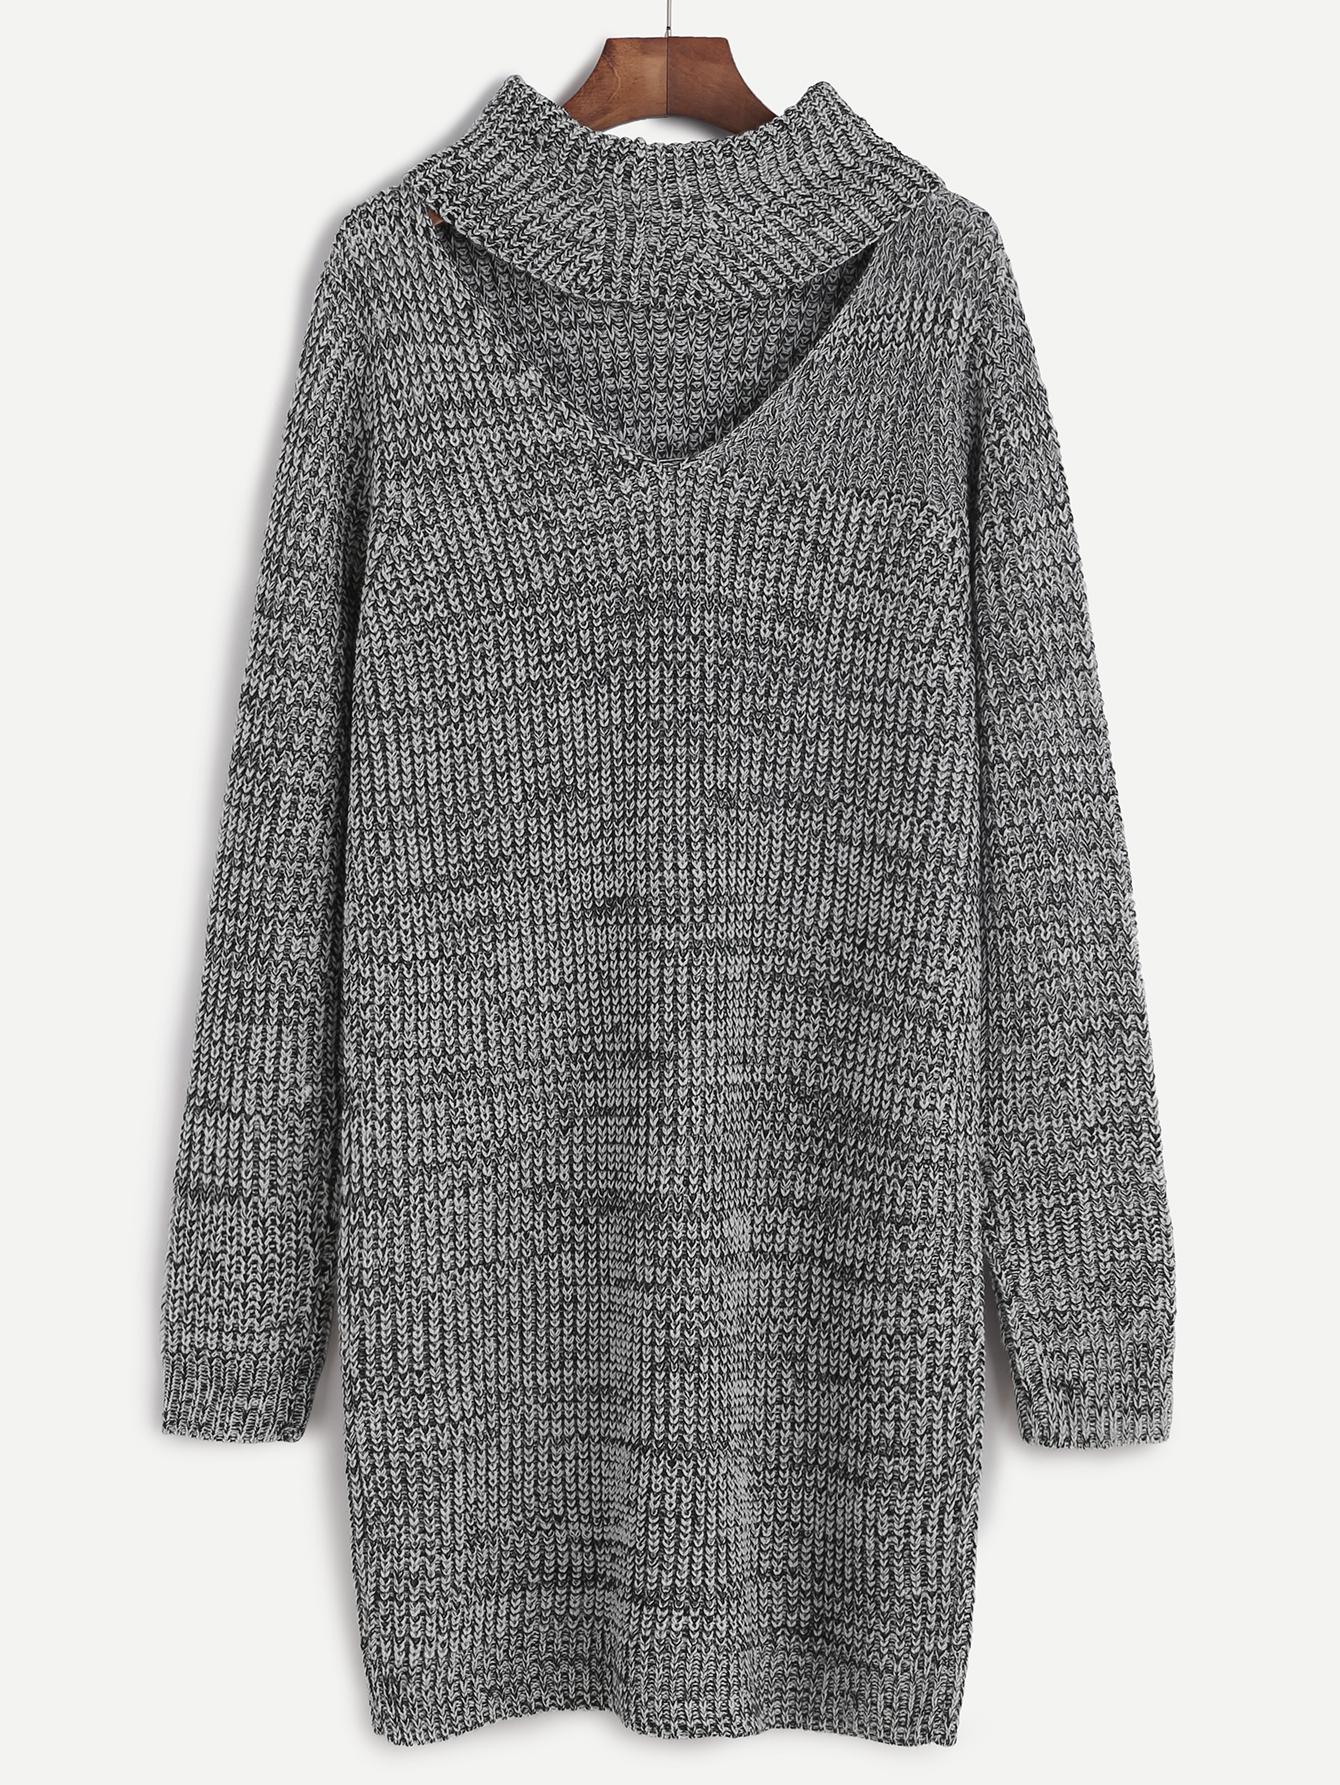 SheIn Grey Knit Cutout Turtleneck Dress